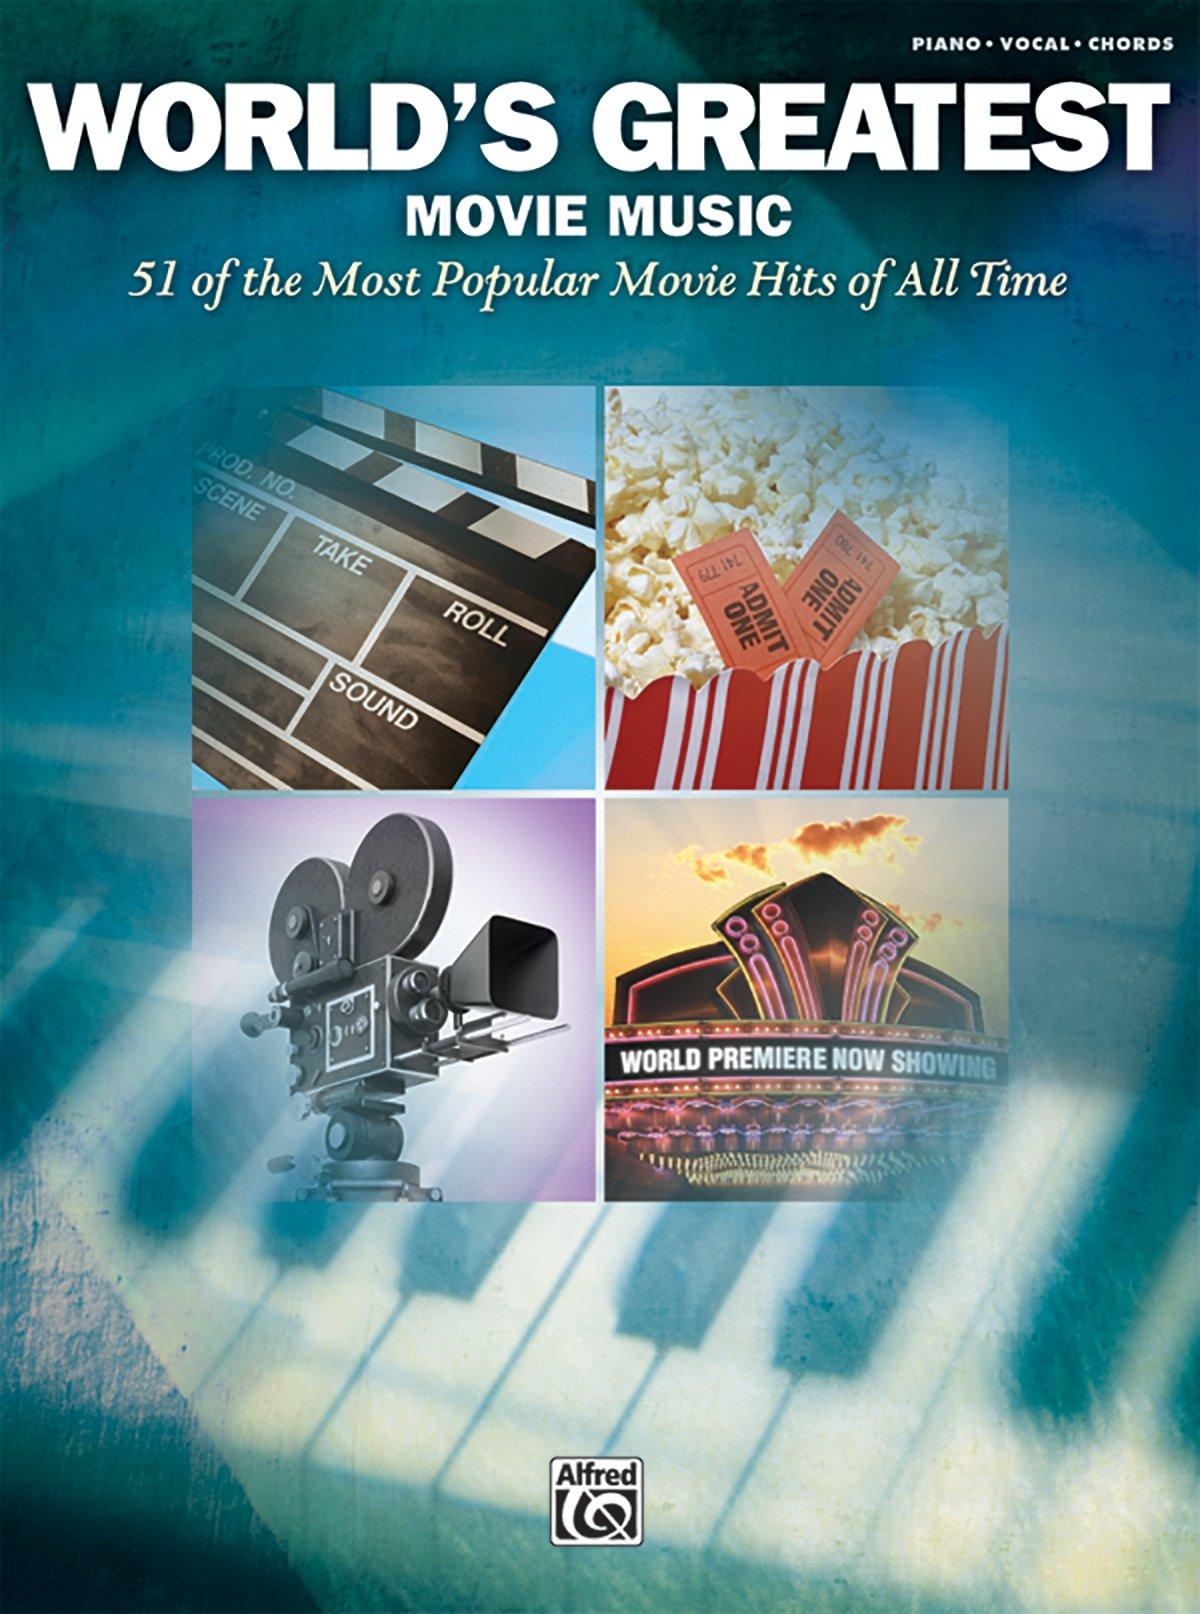 Worlds greatest movie music pianovocalchords alfred music worlds greatest movie music pianovocalchords alfred music 9780739062357 amazon books hexwebz Images